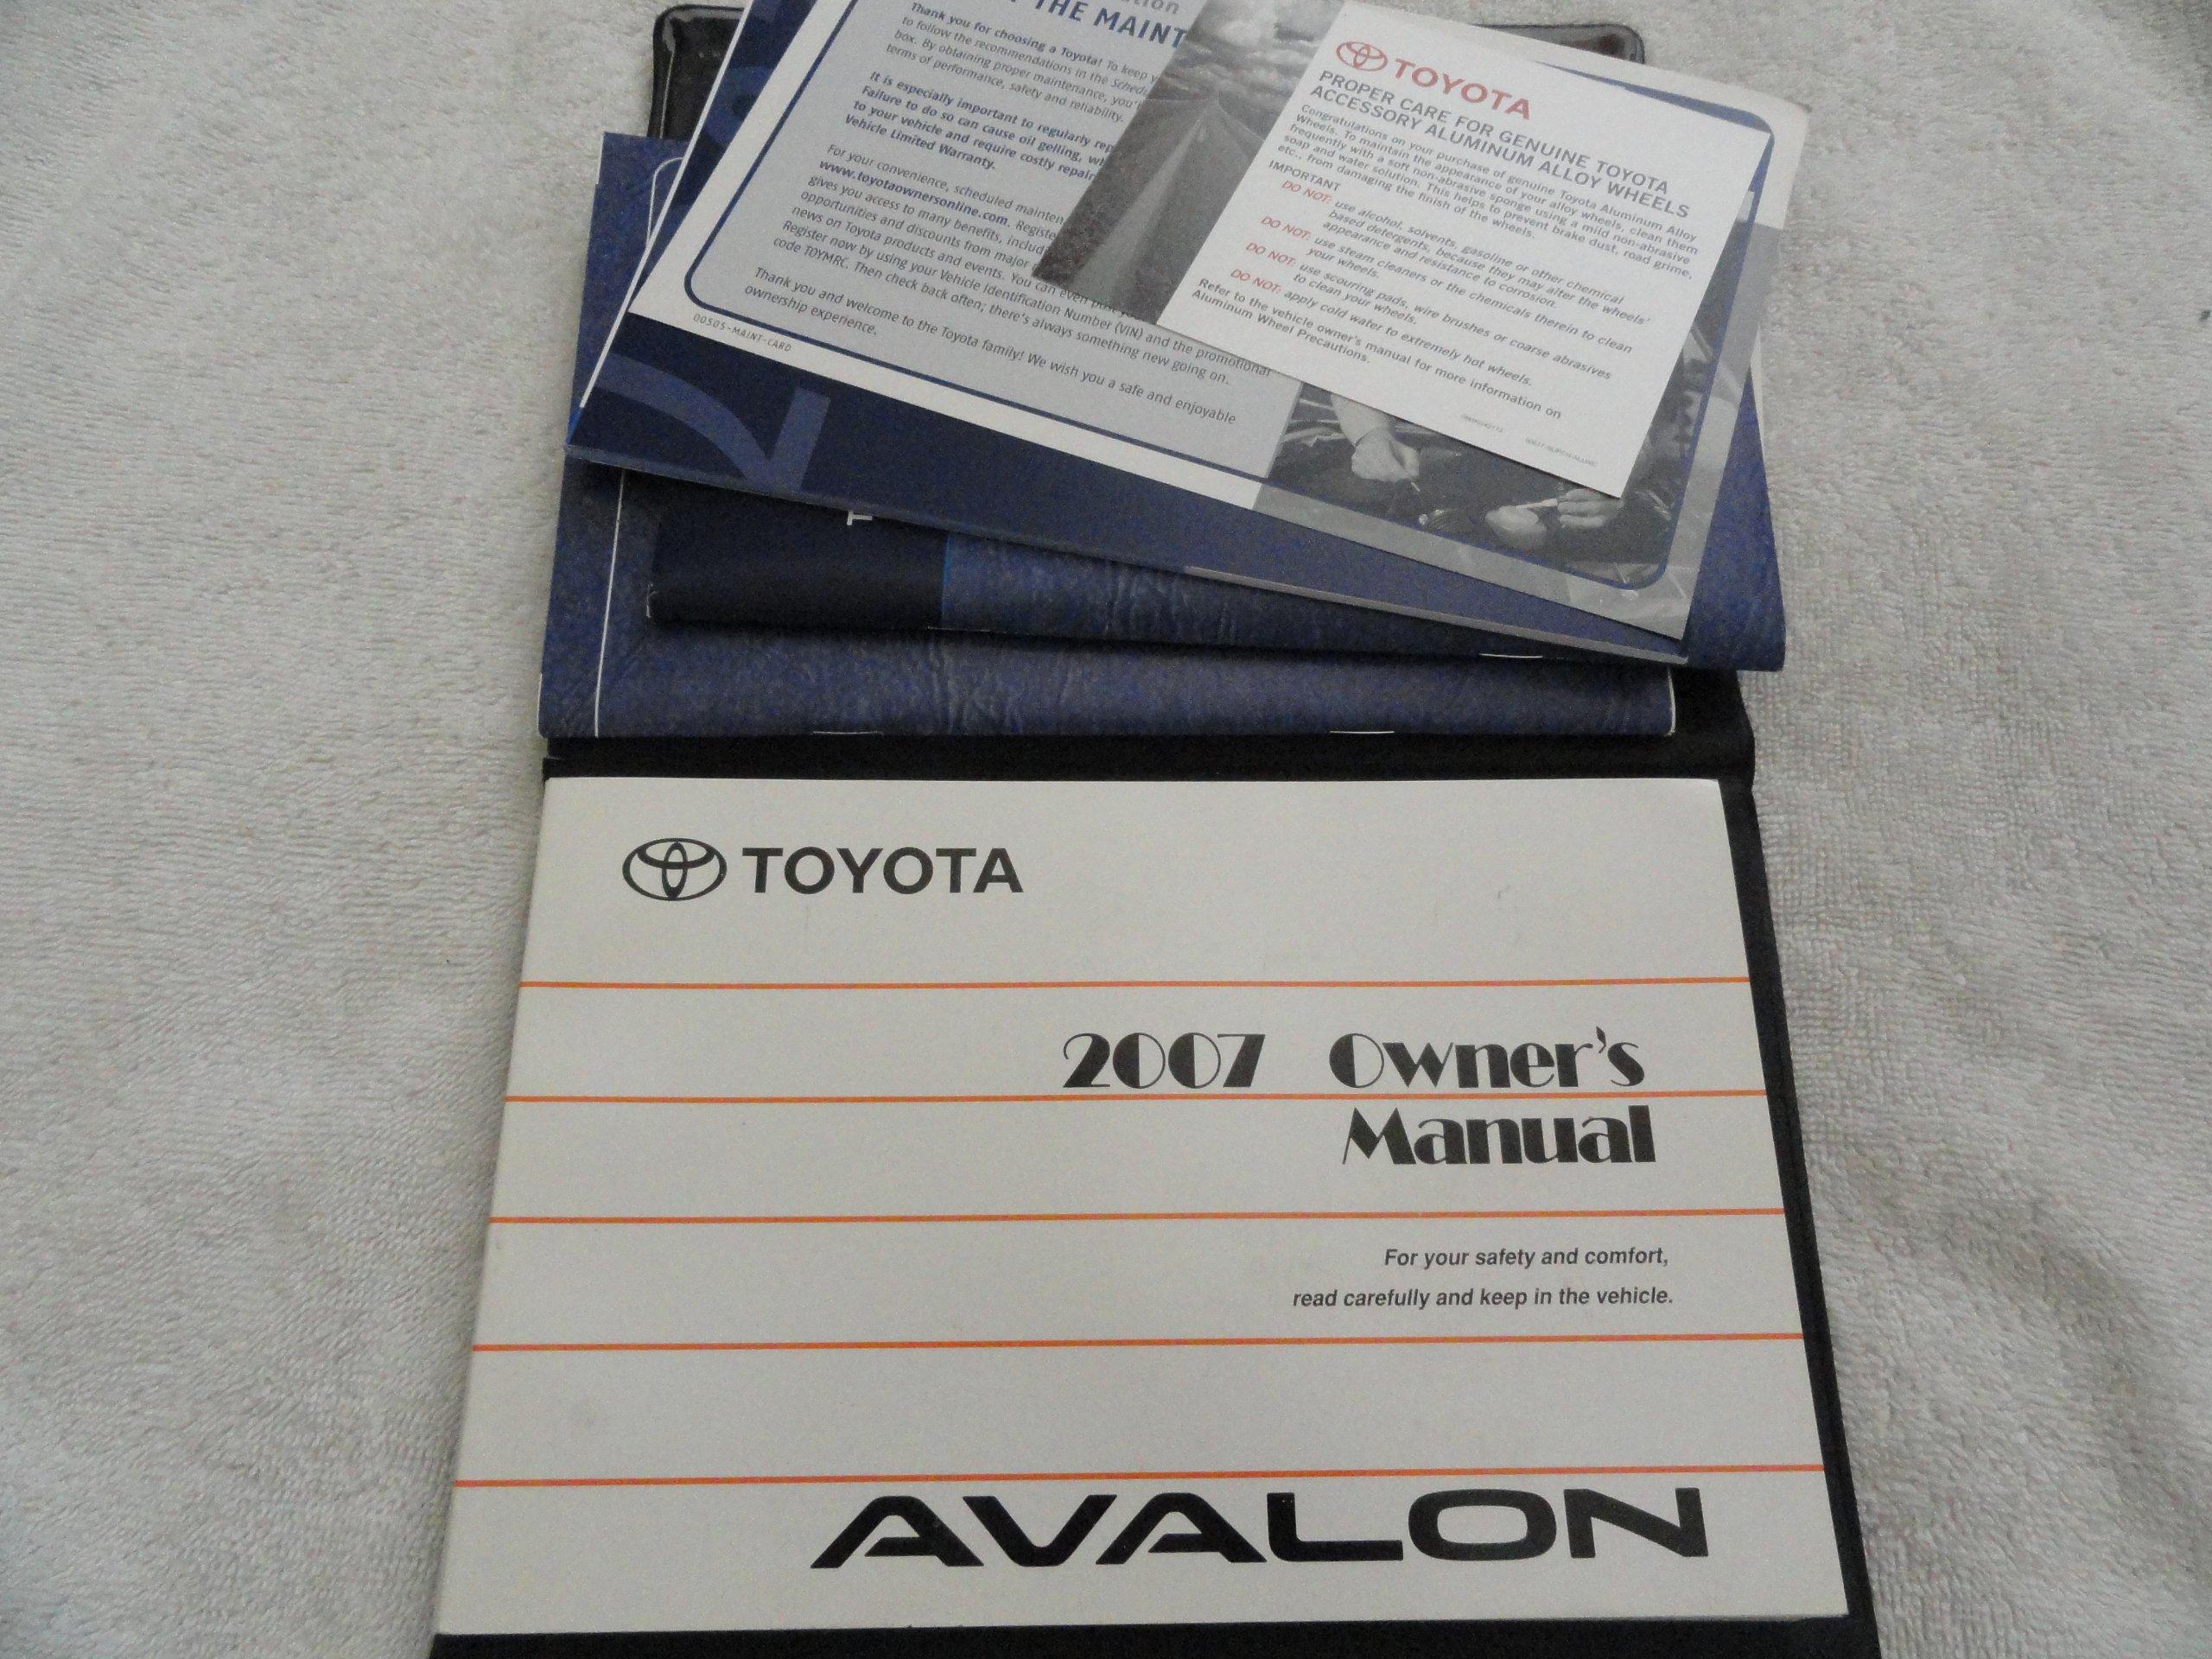 2007 toyota avalon owners manual toyota amazon com books rh amazon com 2008 Toyota Avalon Interior 2008 Toyota Avalon